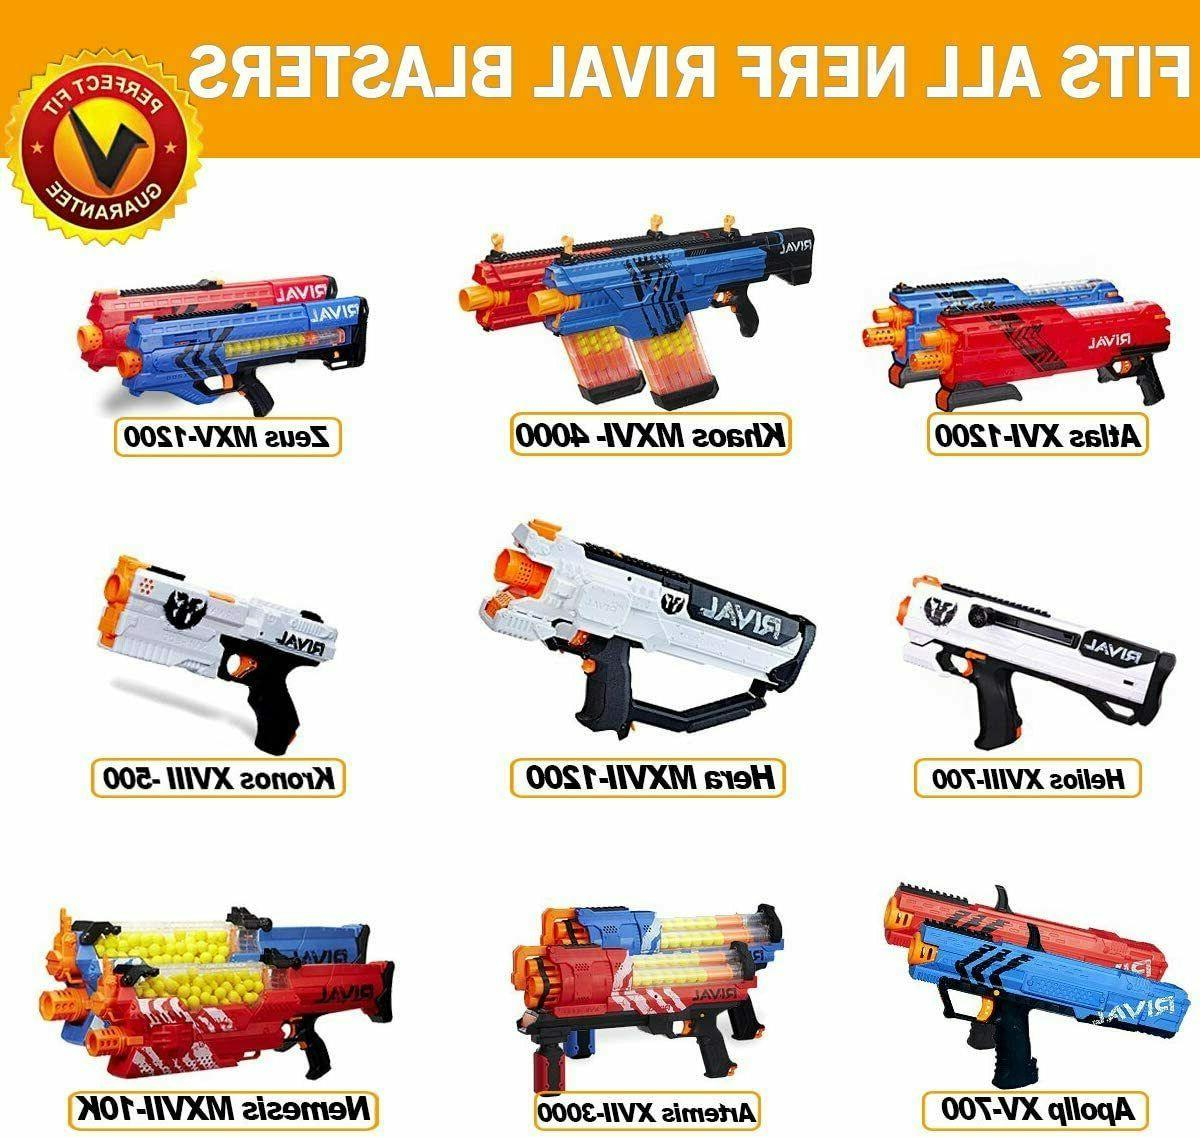 100-Pcs Ball Pack Blaster Series